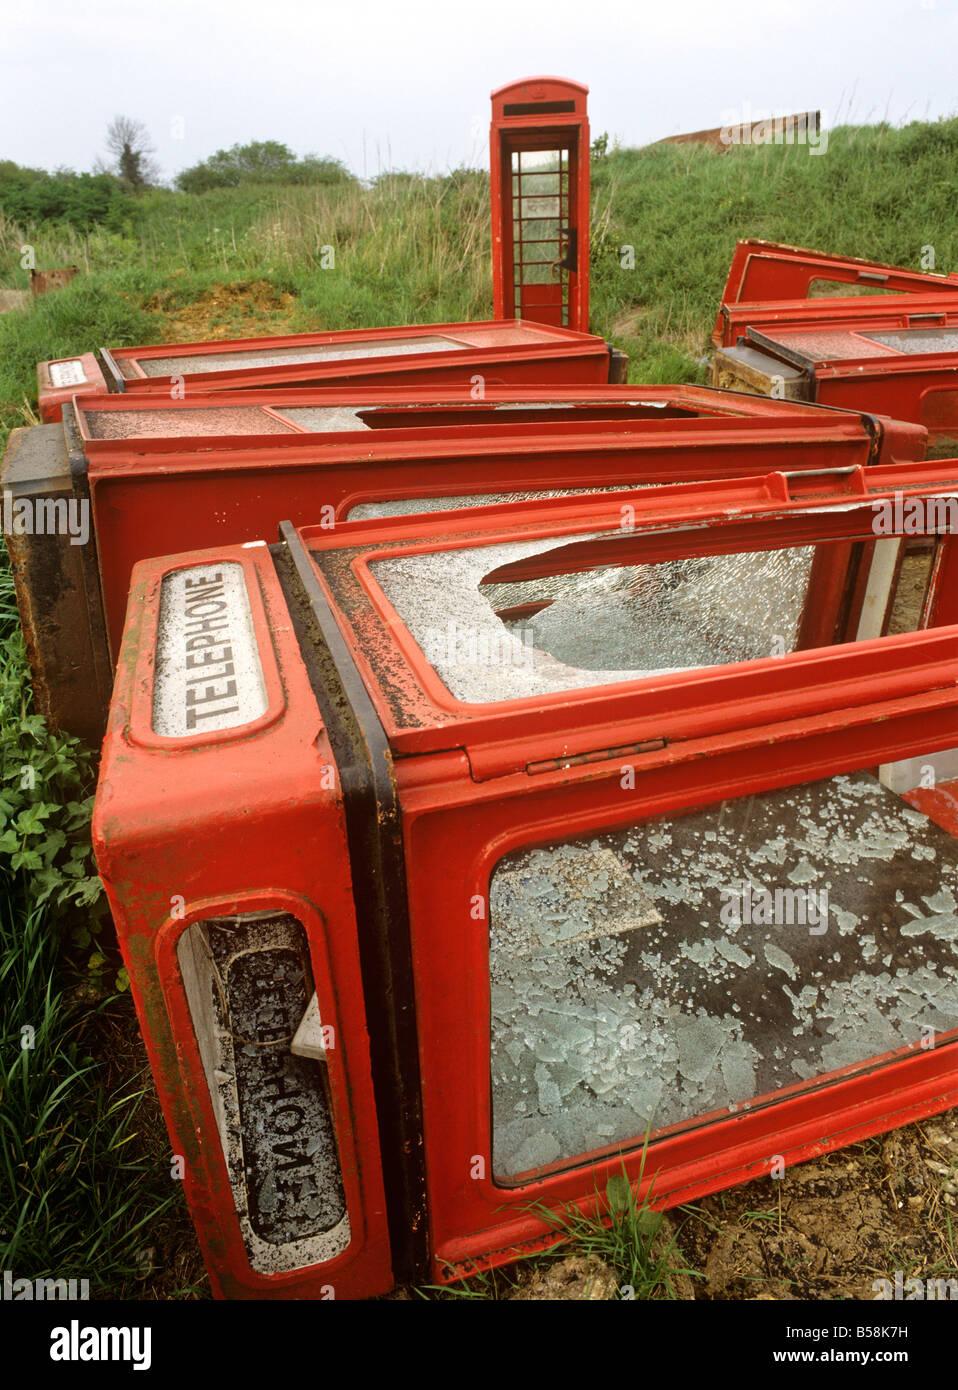 uk england essex fyfield redundant k8 and k6 phoneboxes